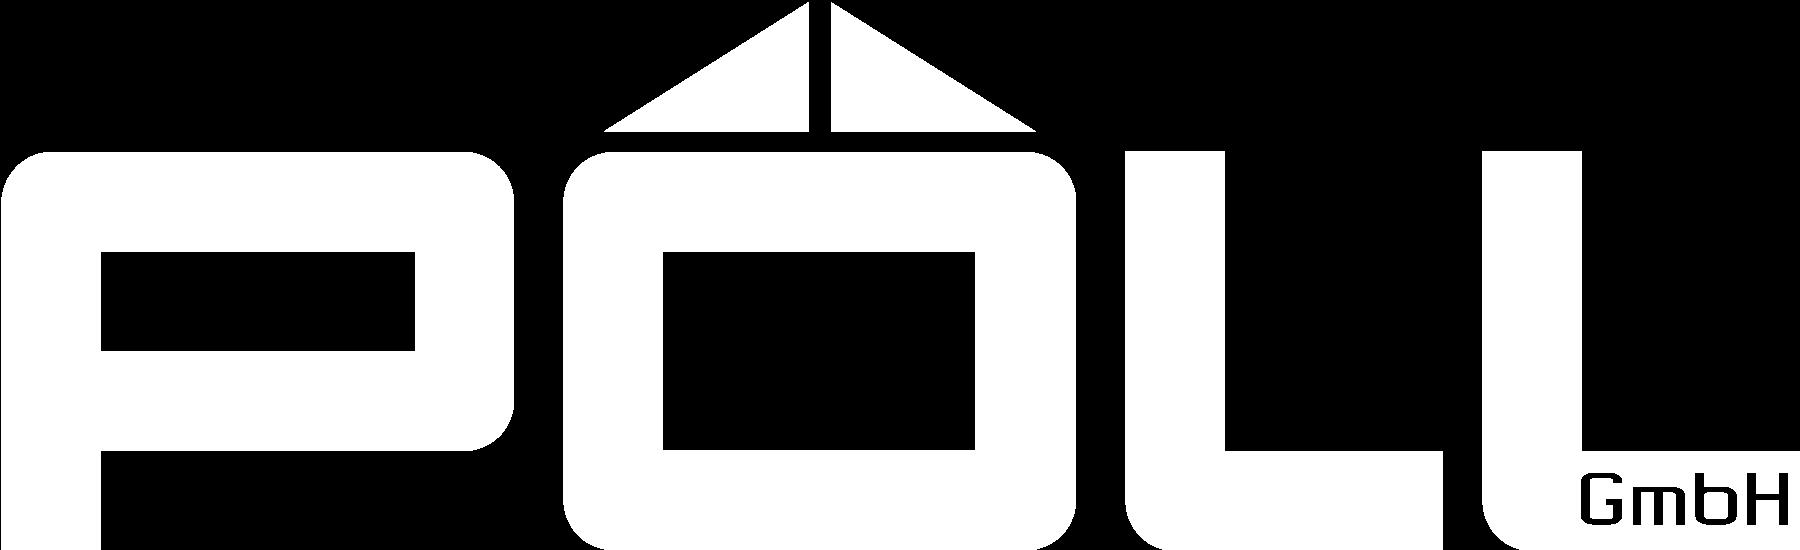 Pöll GmbH